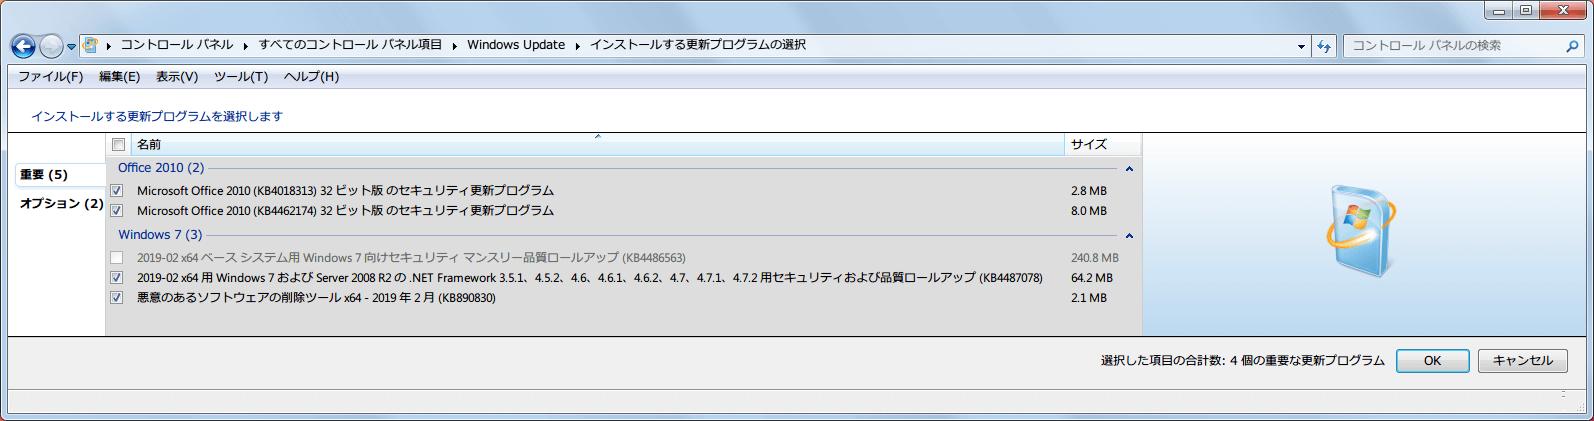 Windows 7 64bit Windows Update 重要 2019年2月分リスト KB4486563 非表示